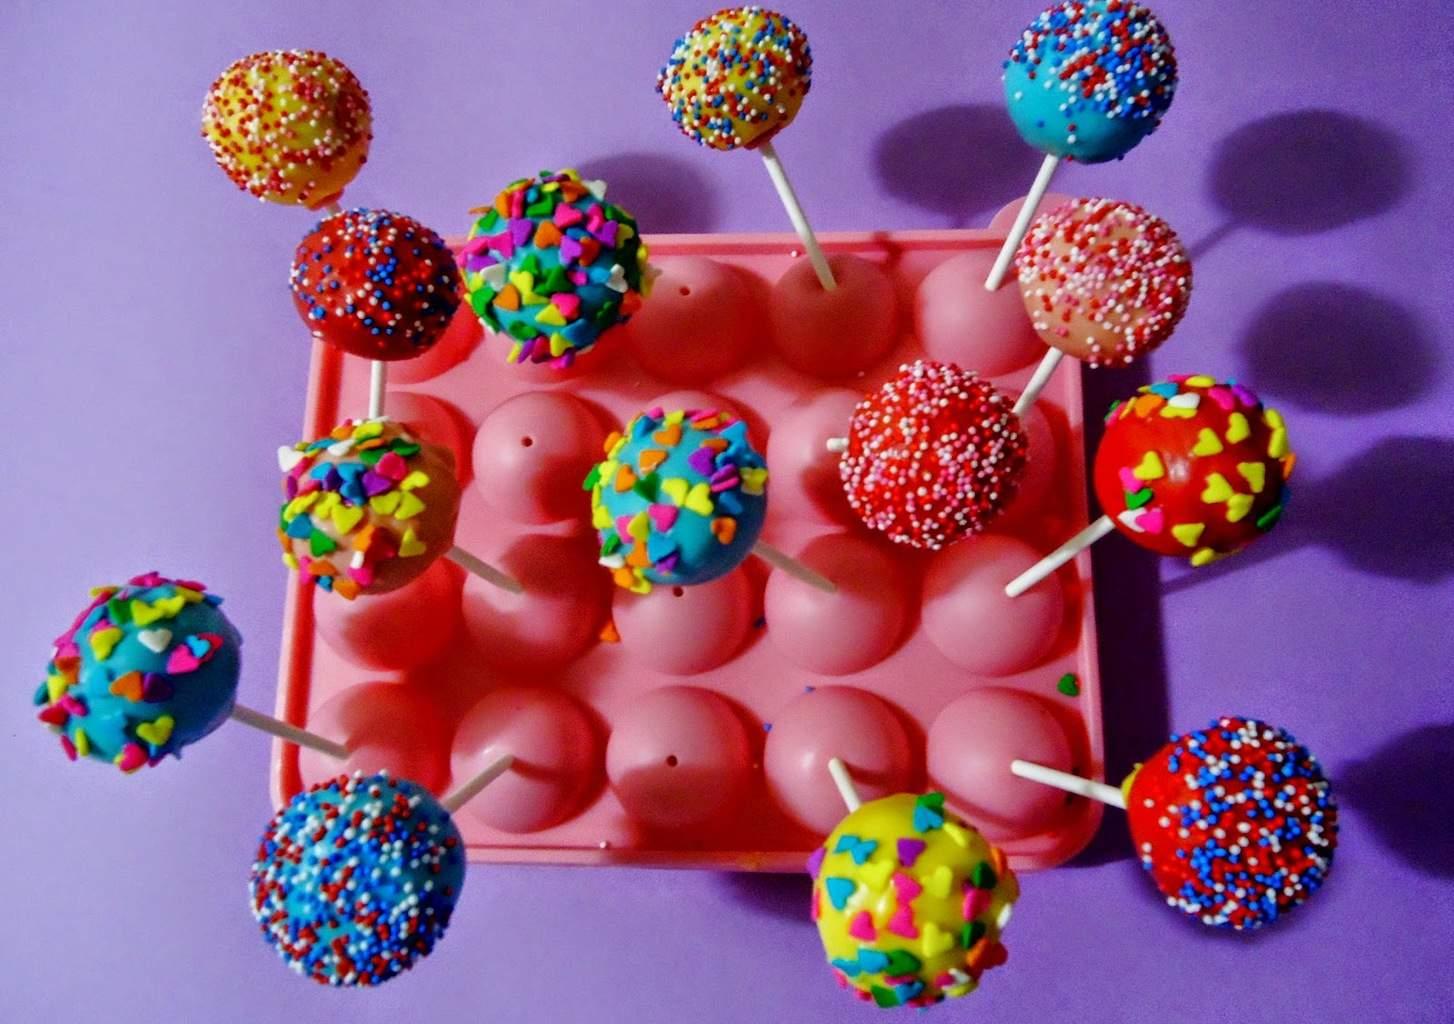 Cake pops diversi n asegurada para grandes y peques for Cake pops cobertura